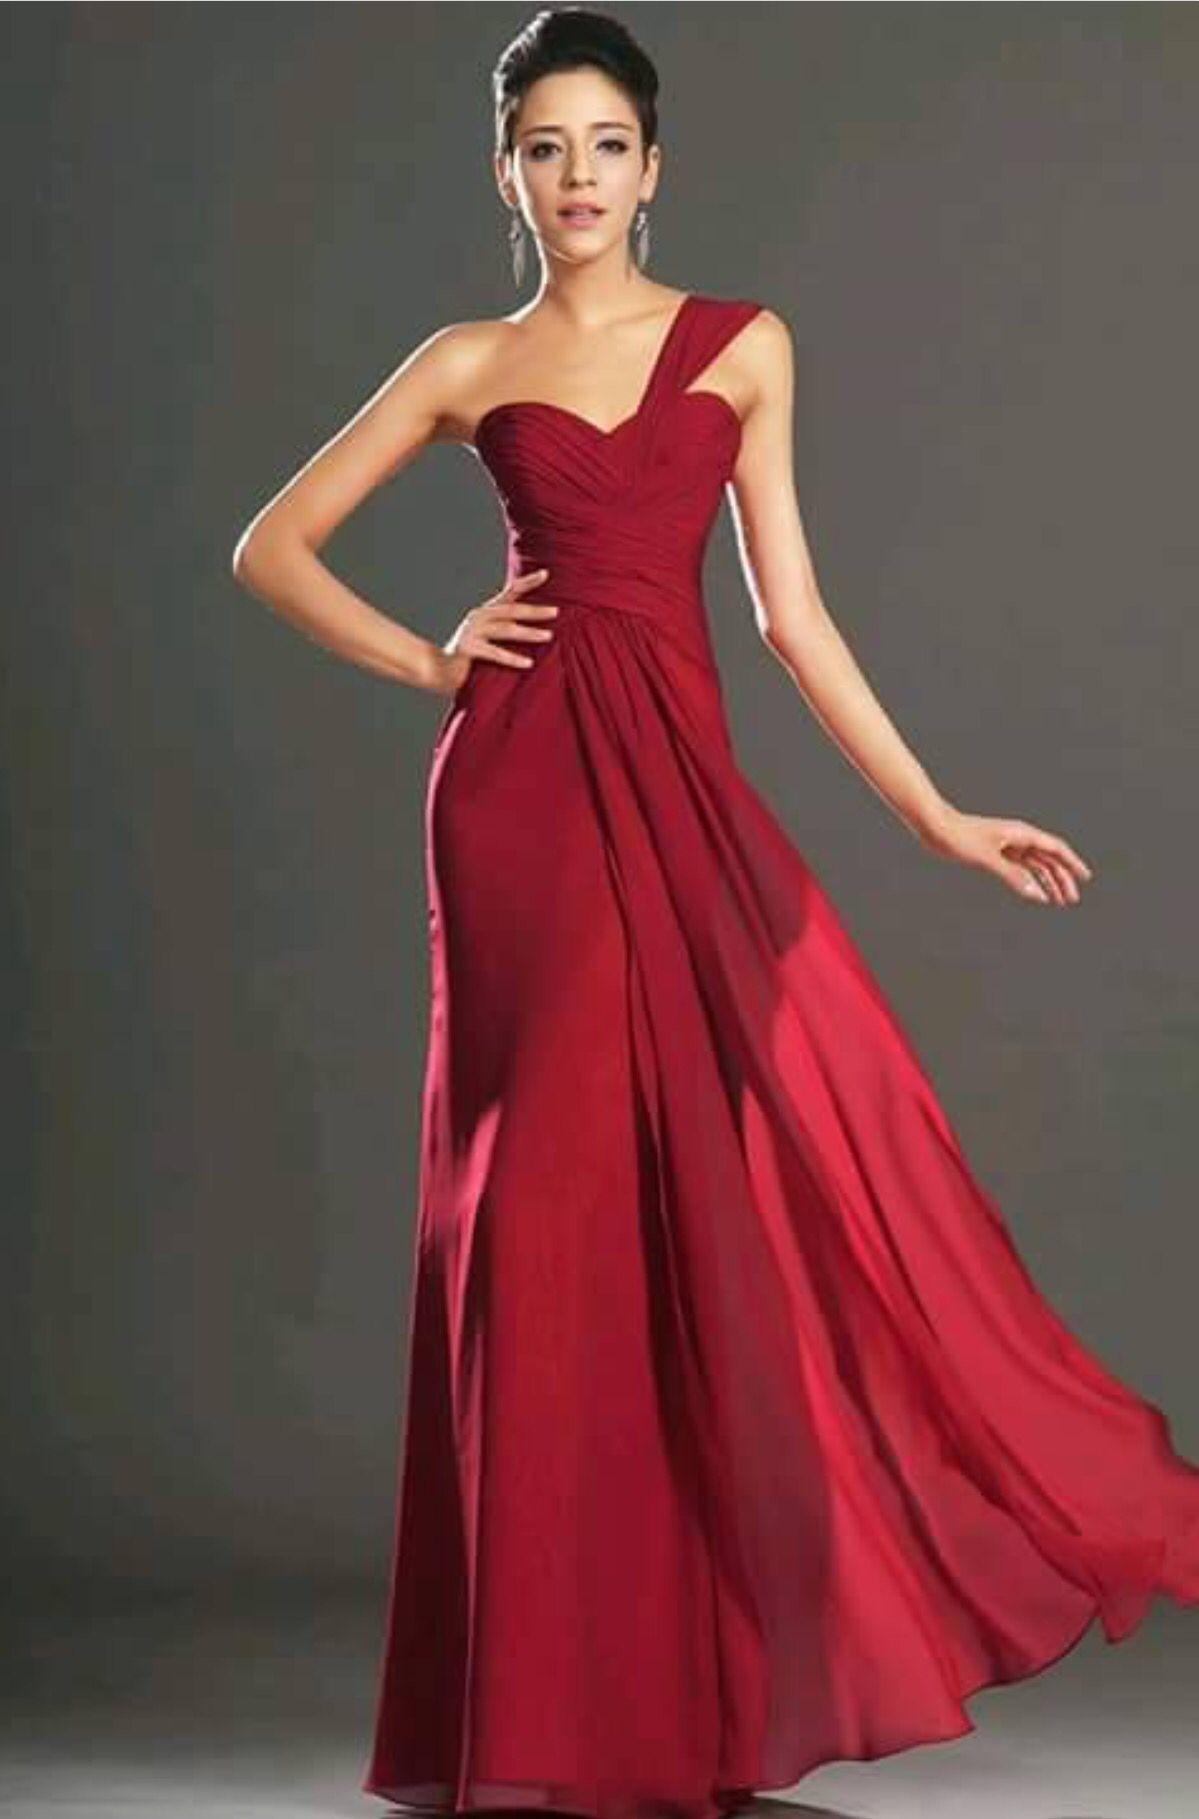 Vestido largo tono rojo quemado | Maid of honor | Pinterest | Maids ...